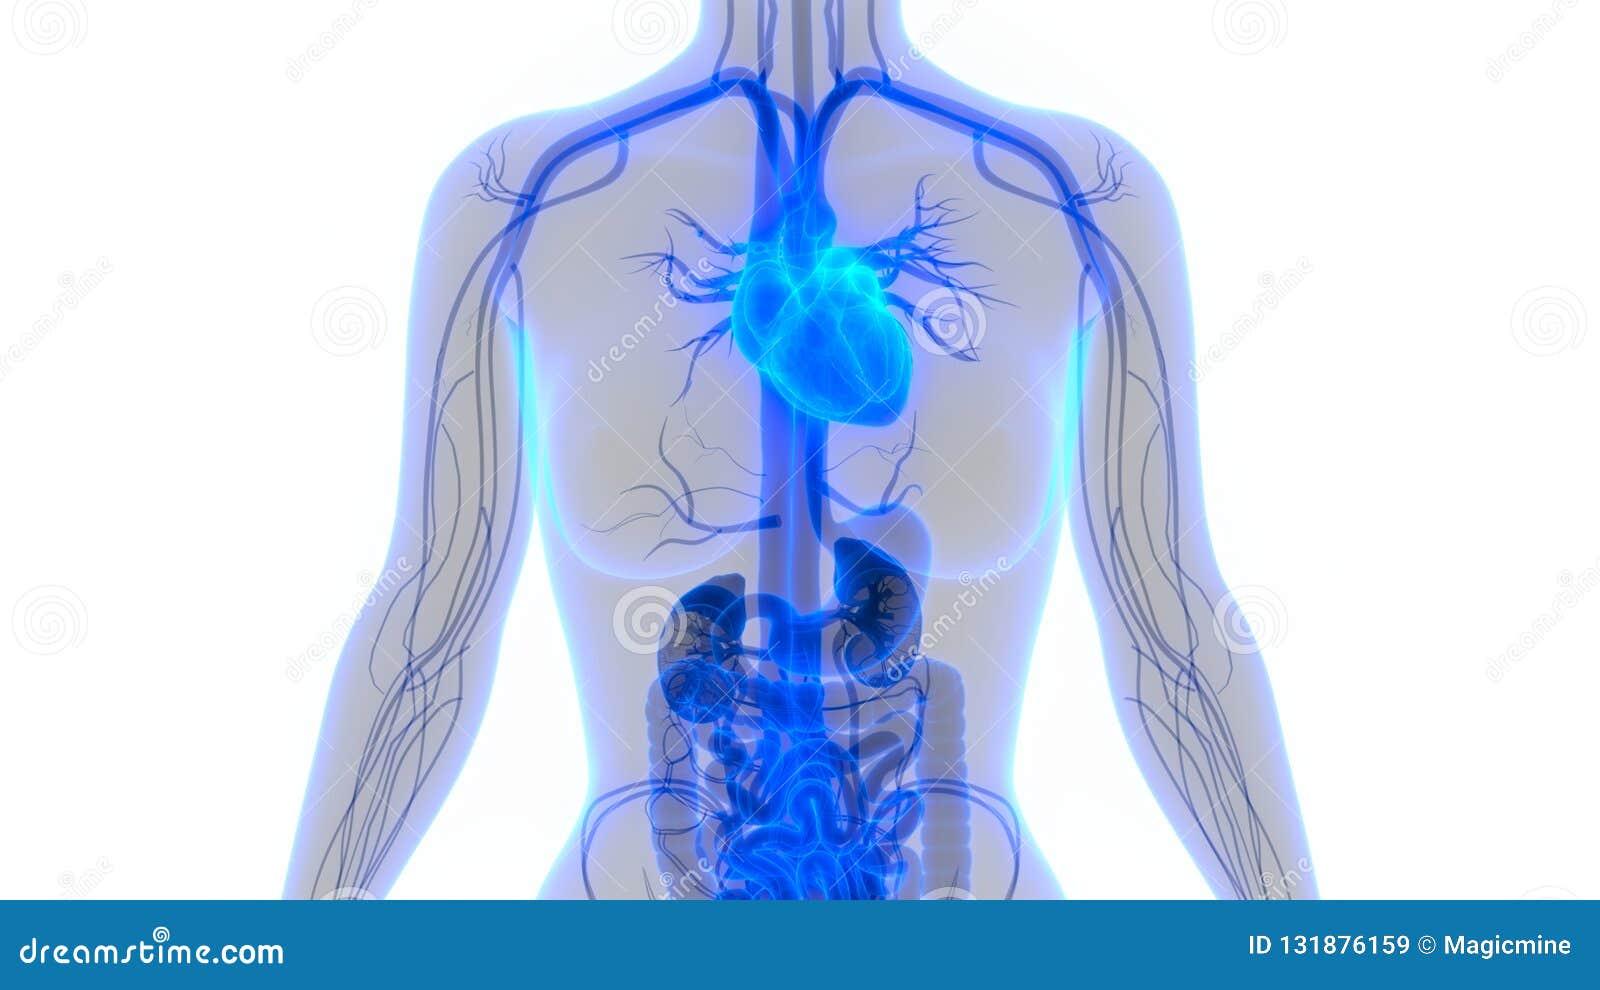 Human Body Organs Circulatory System With Heart Anatomy Stock